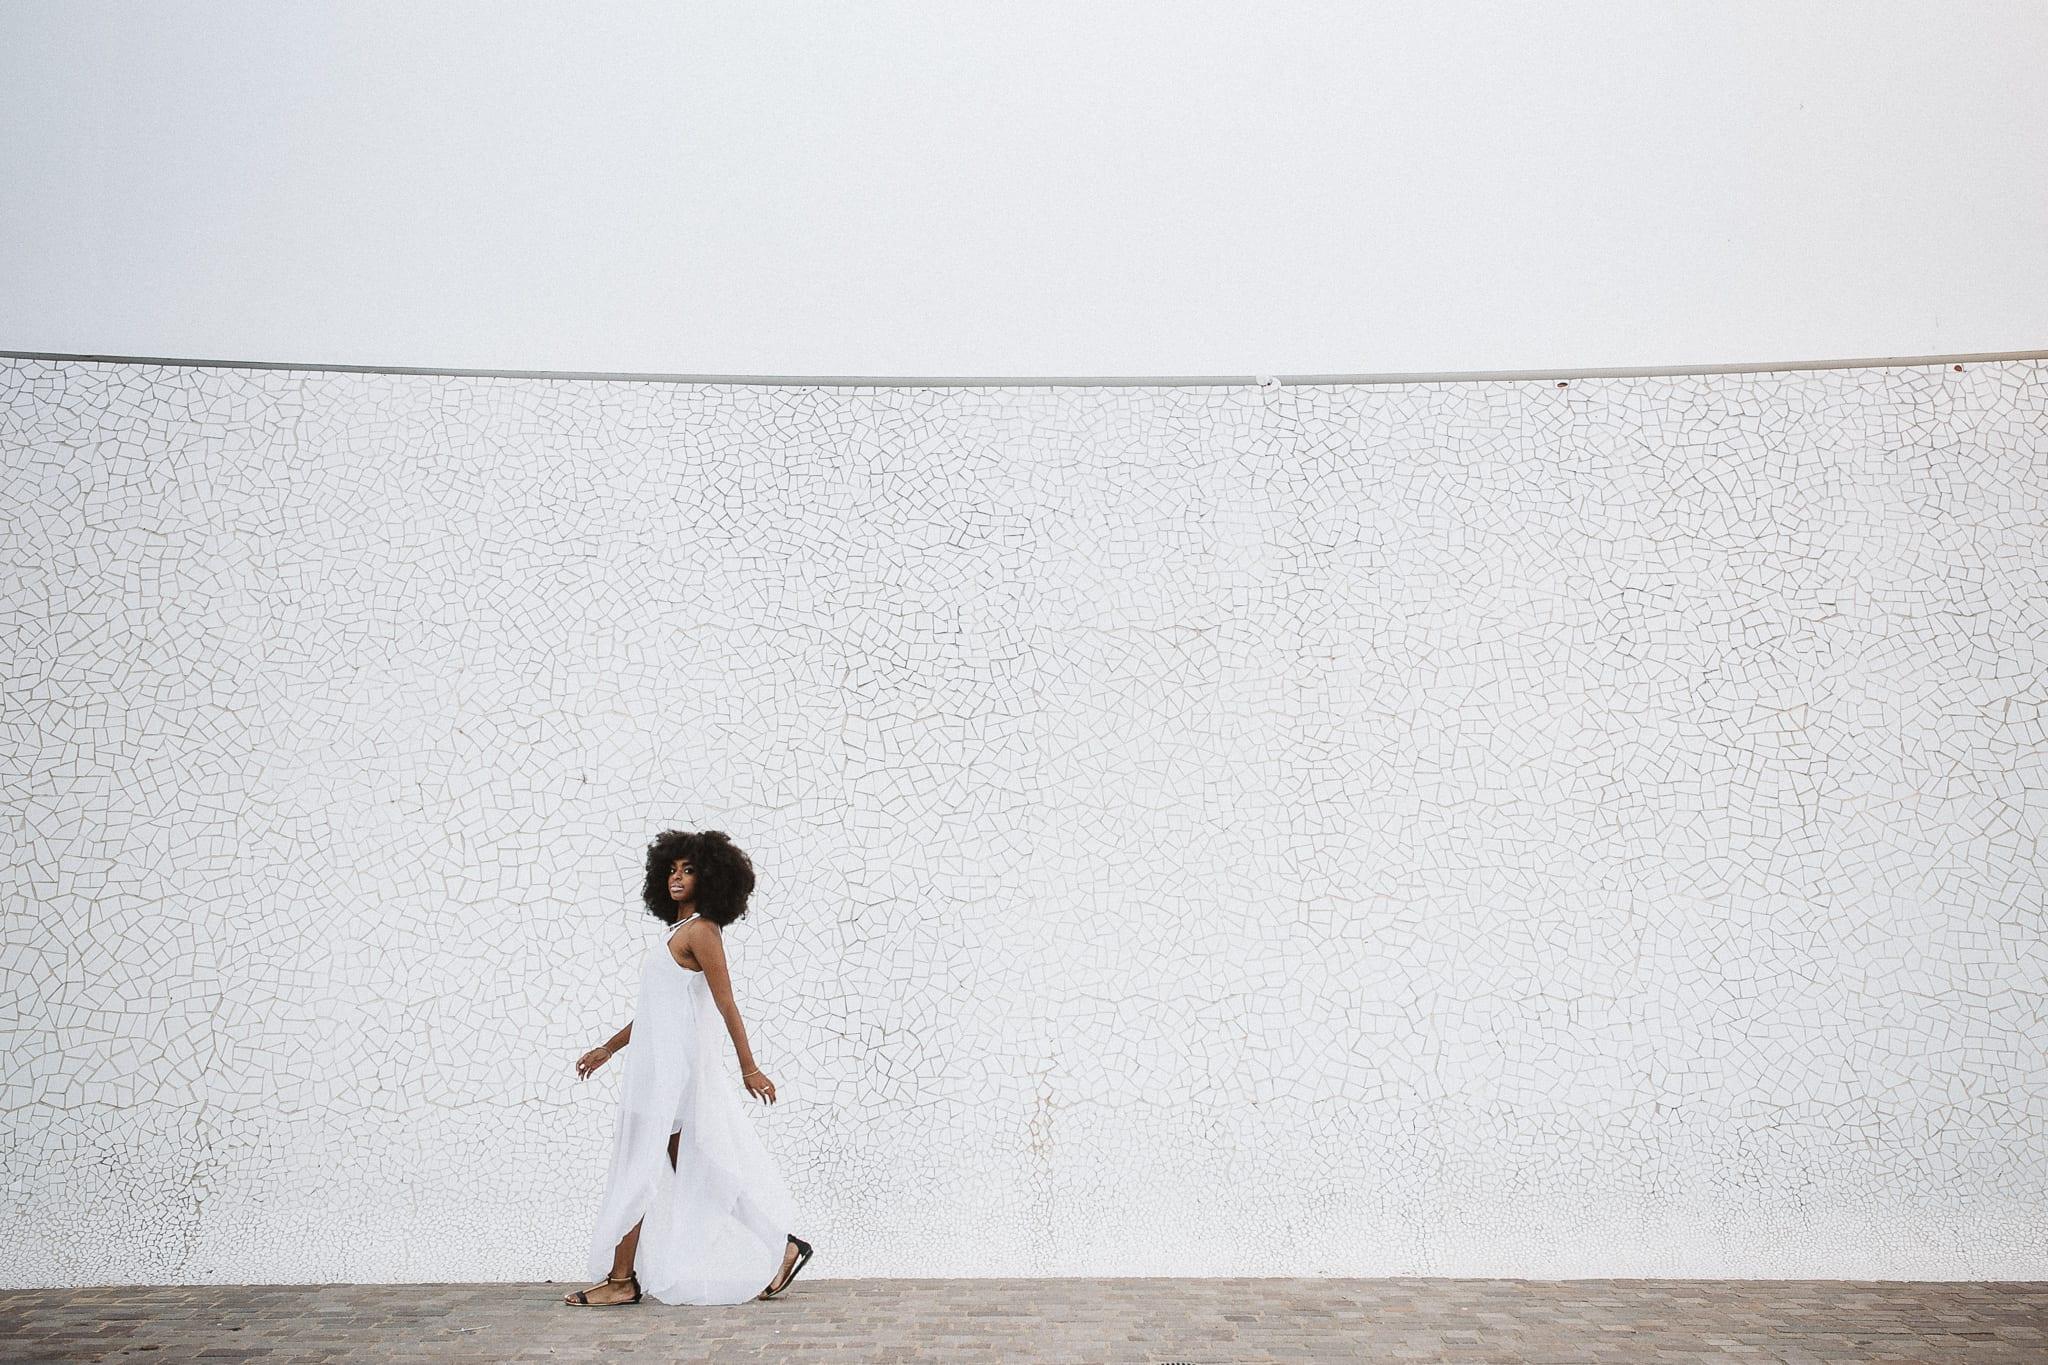 sundial-bridge-california-portrait-photographer-black-afro-queen-birthday-2